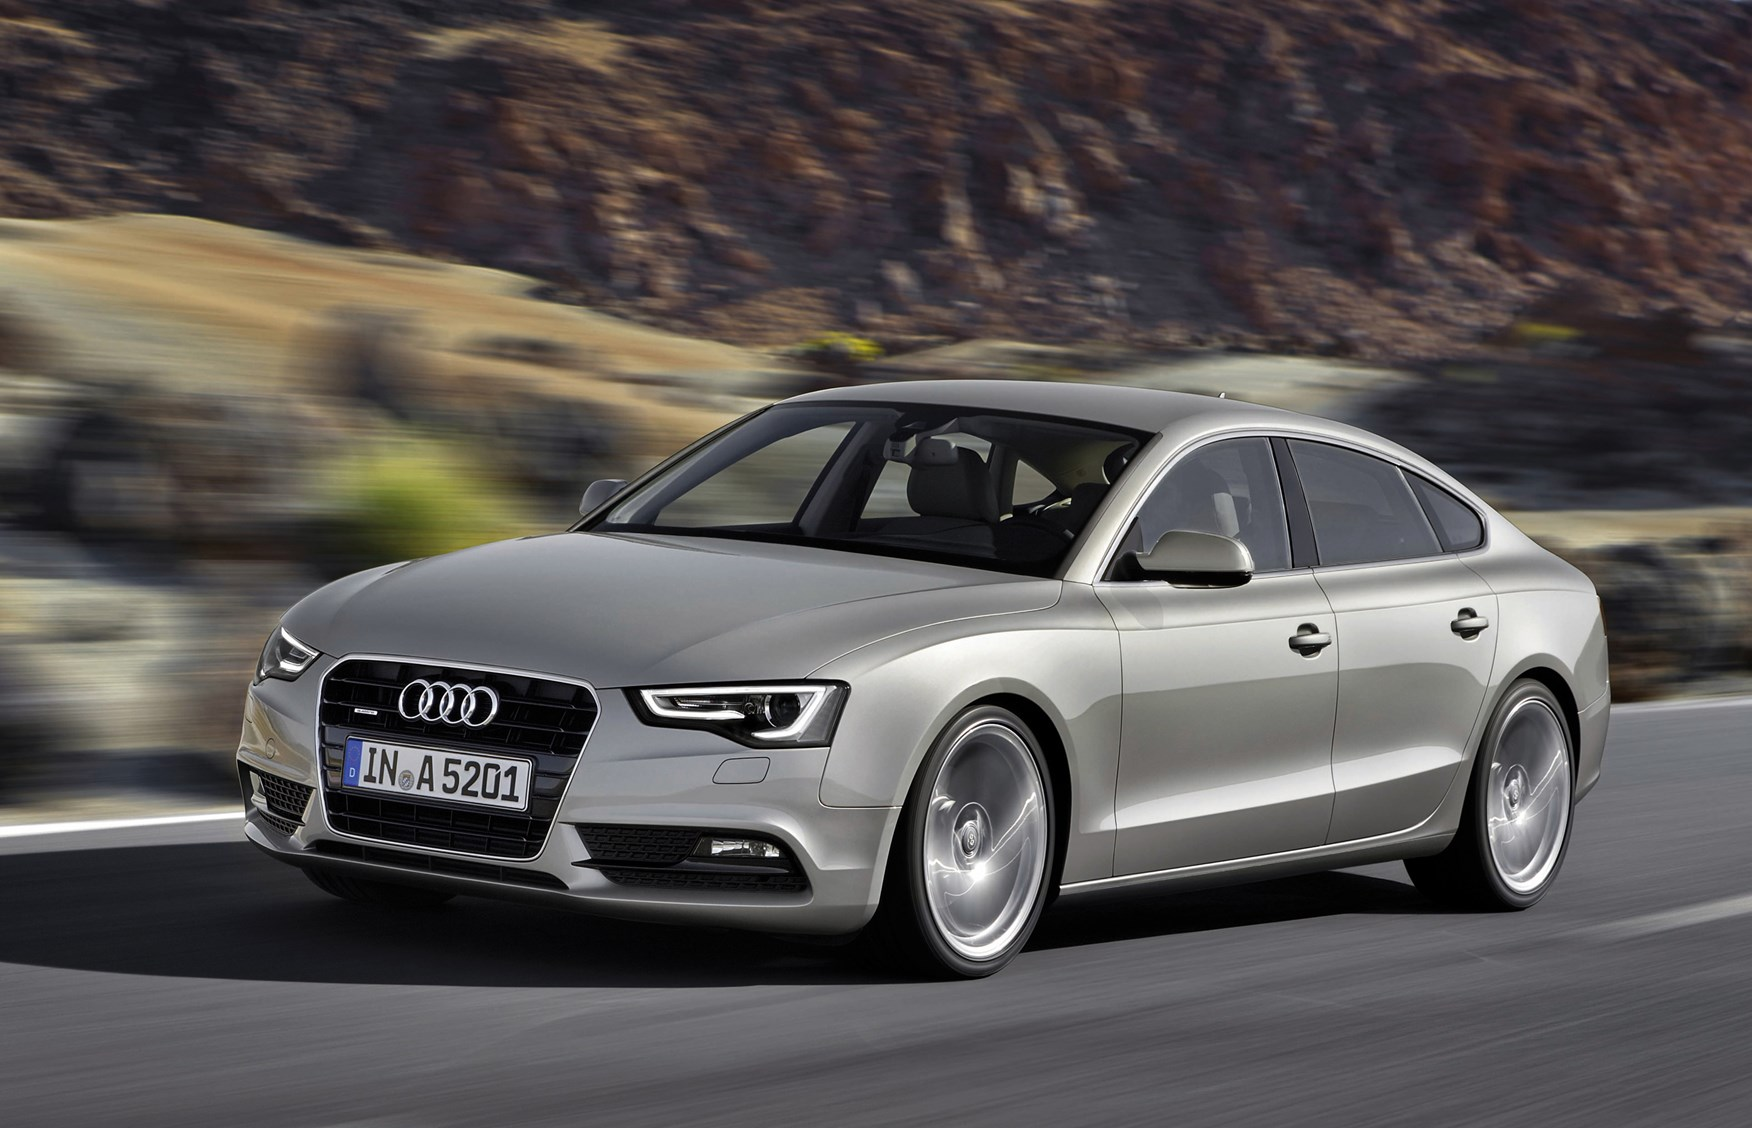 Kekurangan Audi A5 2007 Tangguh